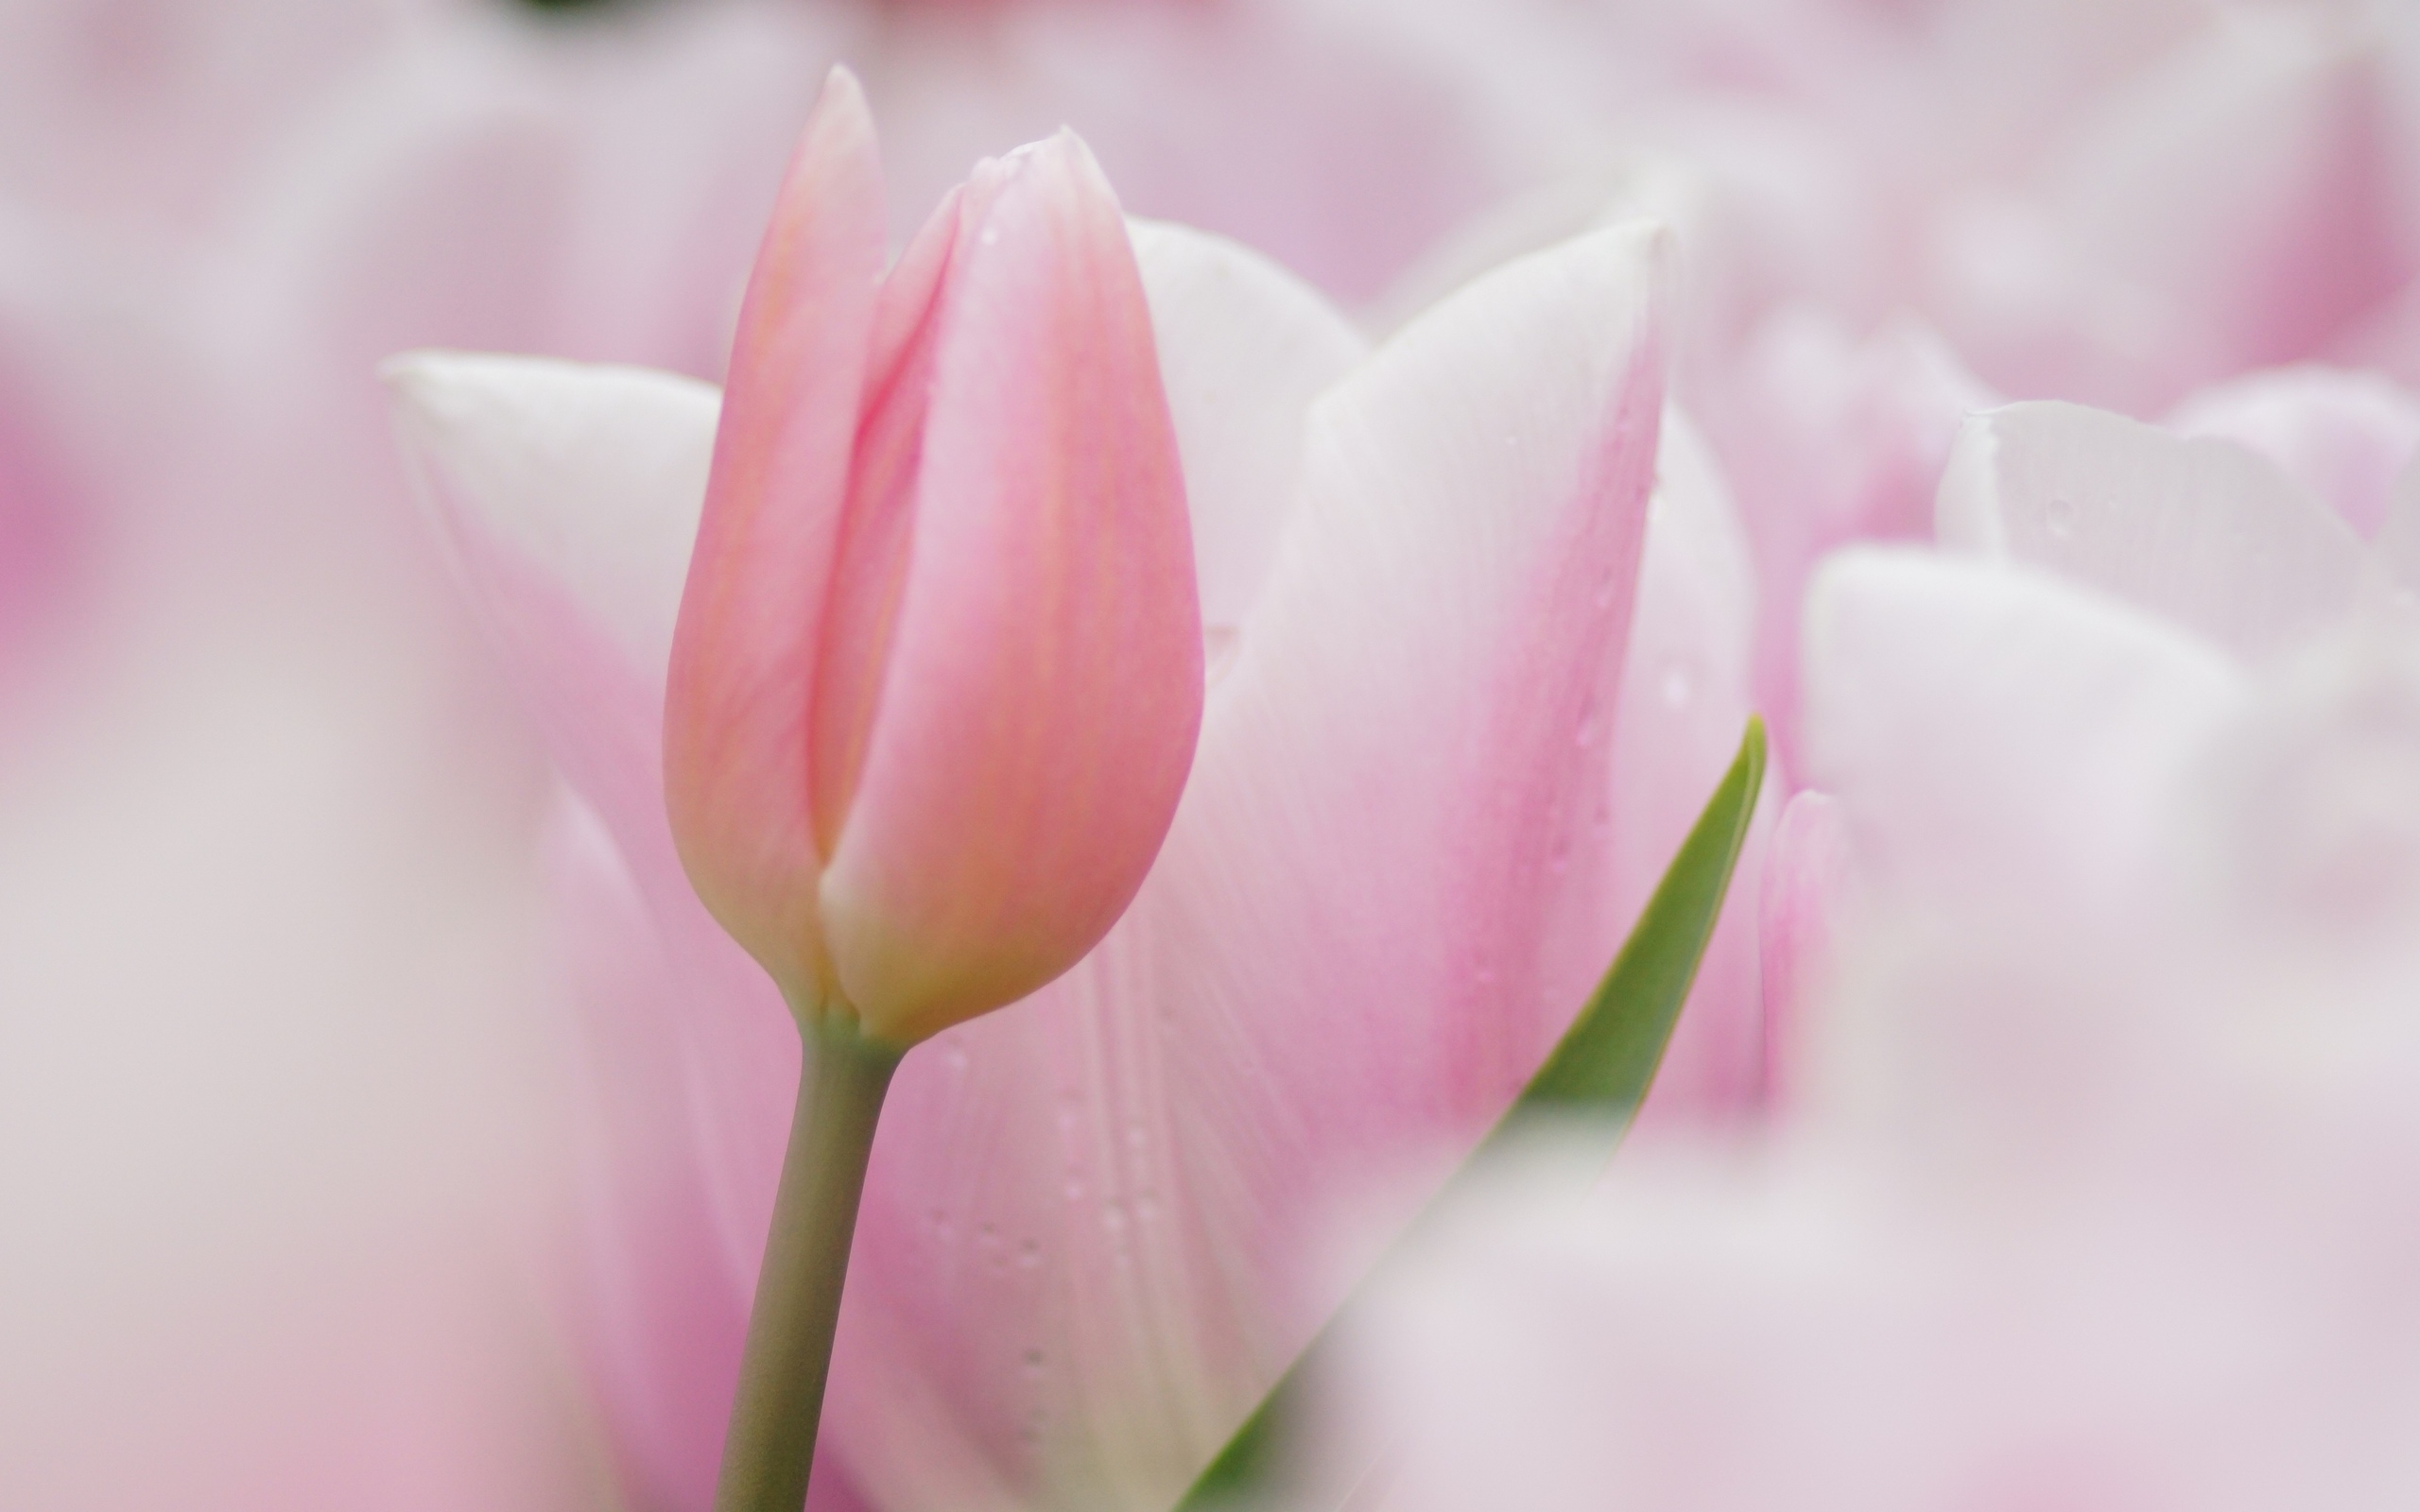 тюльпан, розовый, бутон